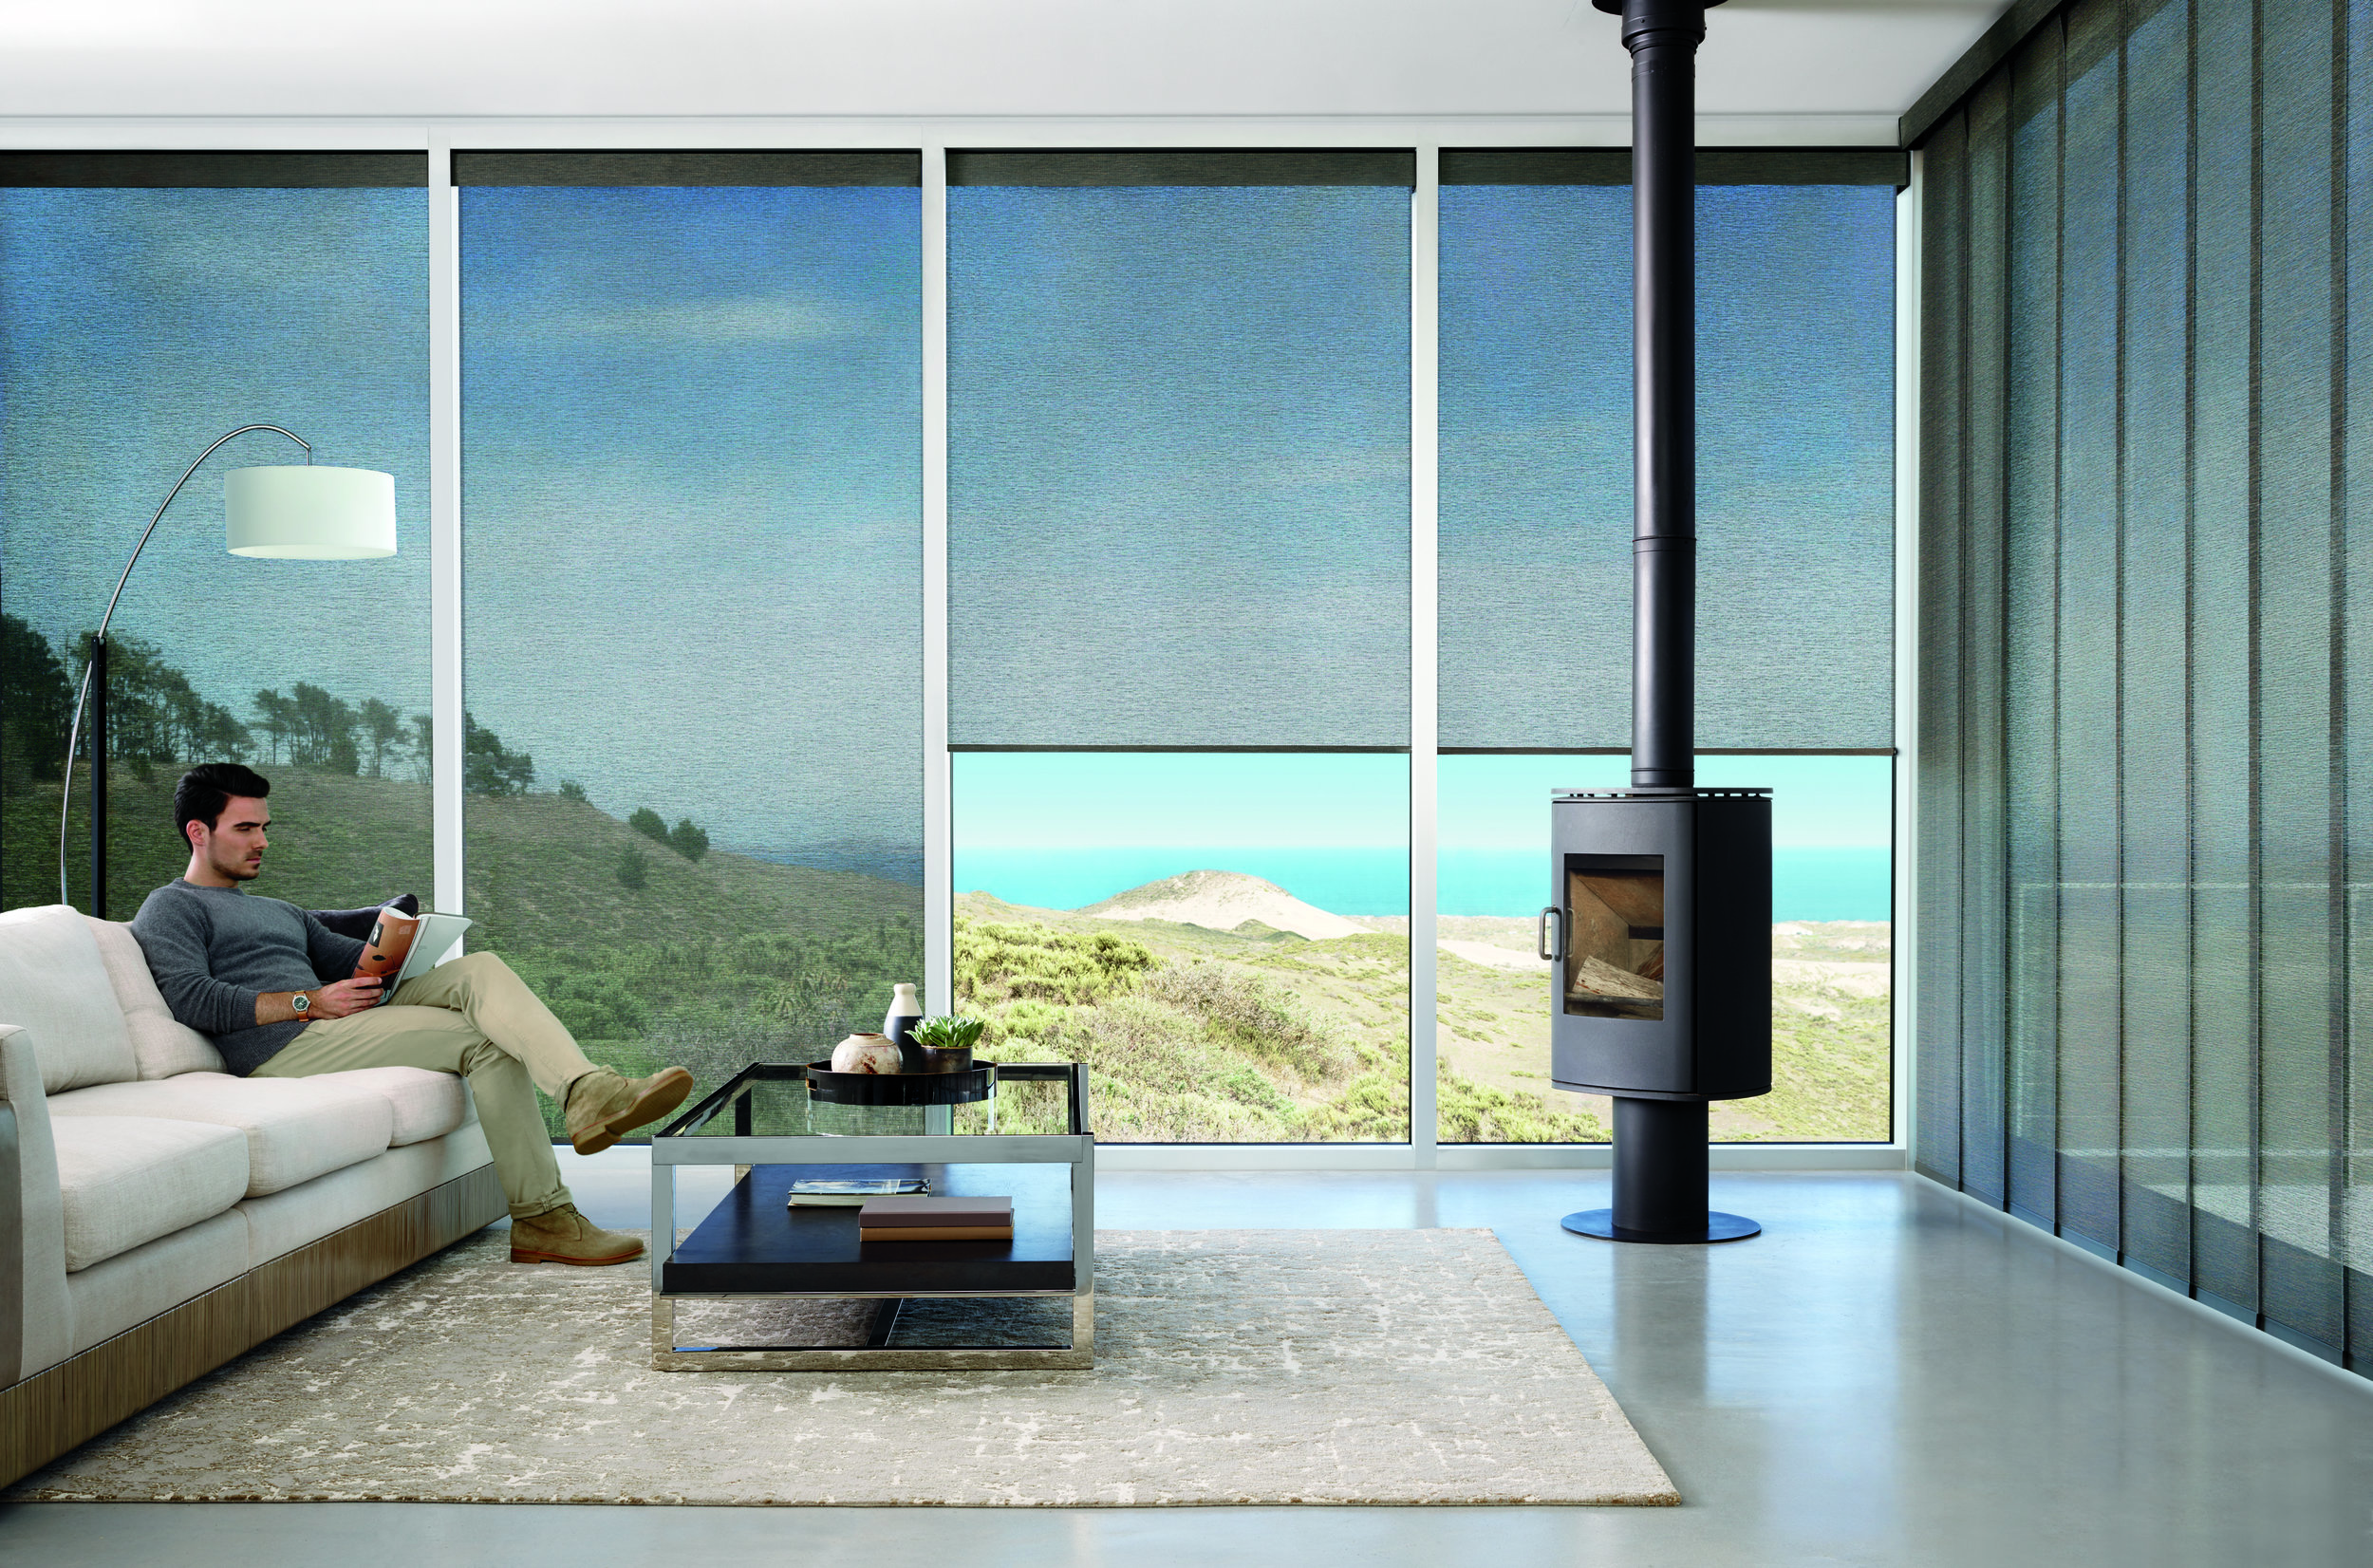 2017 ALU_Roller_Skyline_Zola_Living Room_Model.jpeg